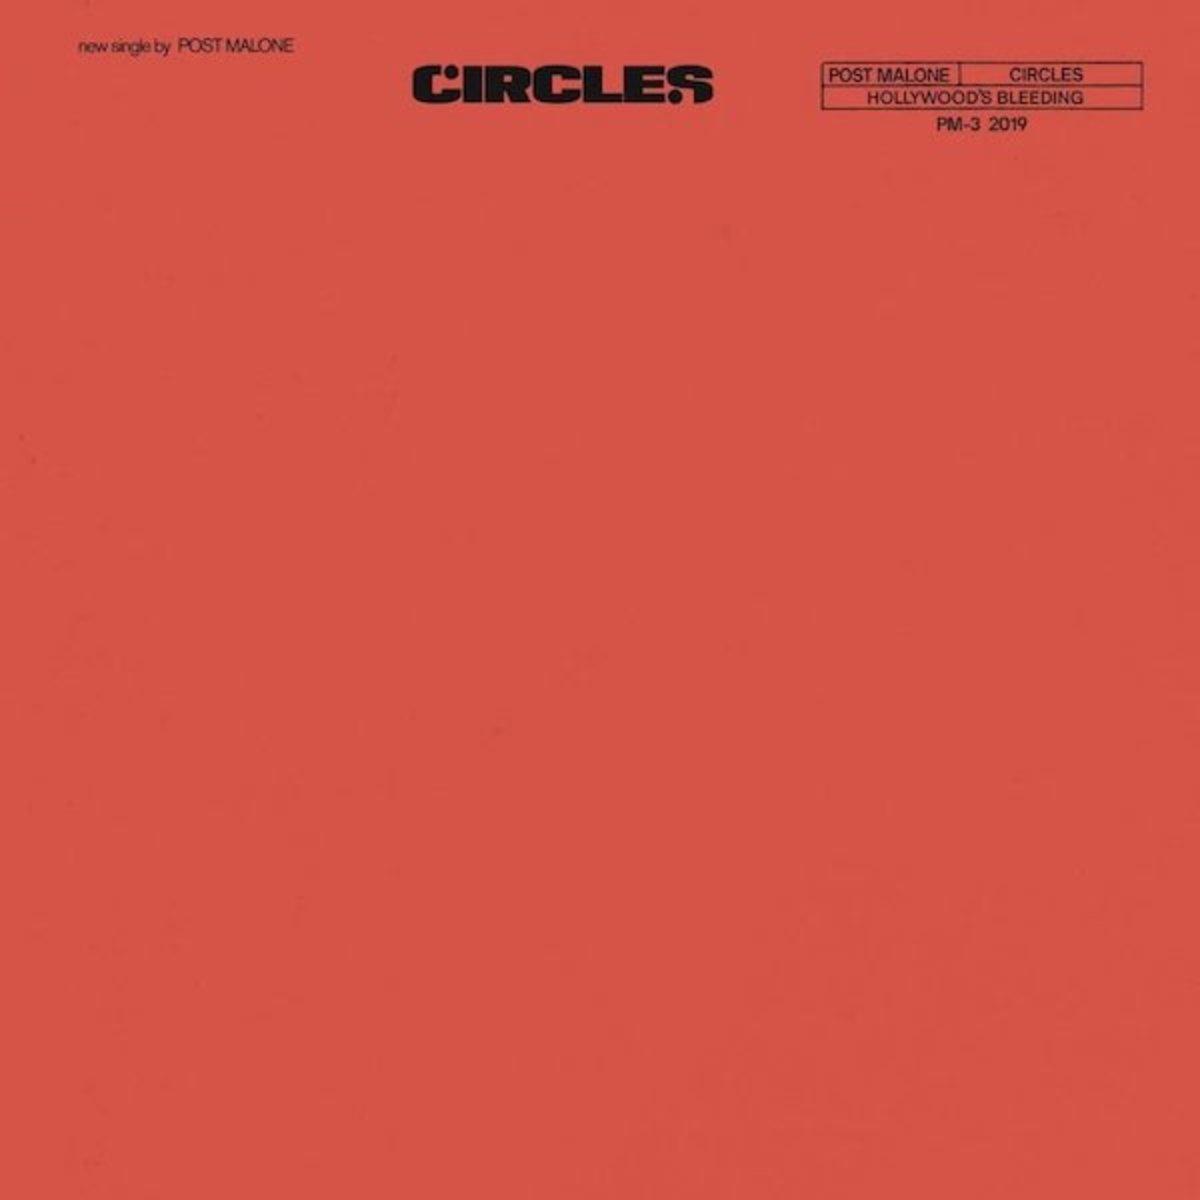 Post Malone Single: Stream Post Malone's New Single 'Circles'